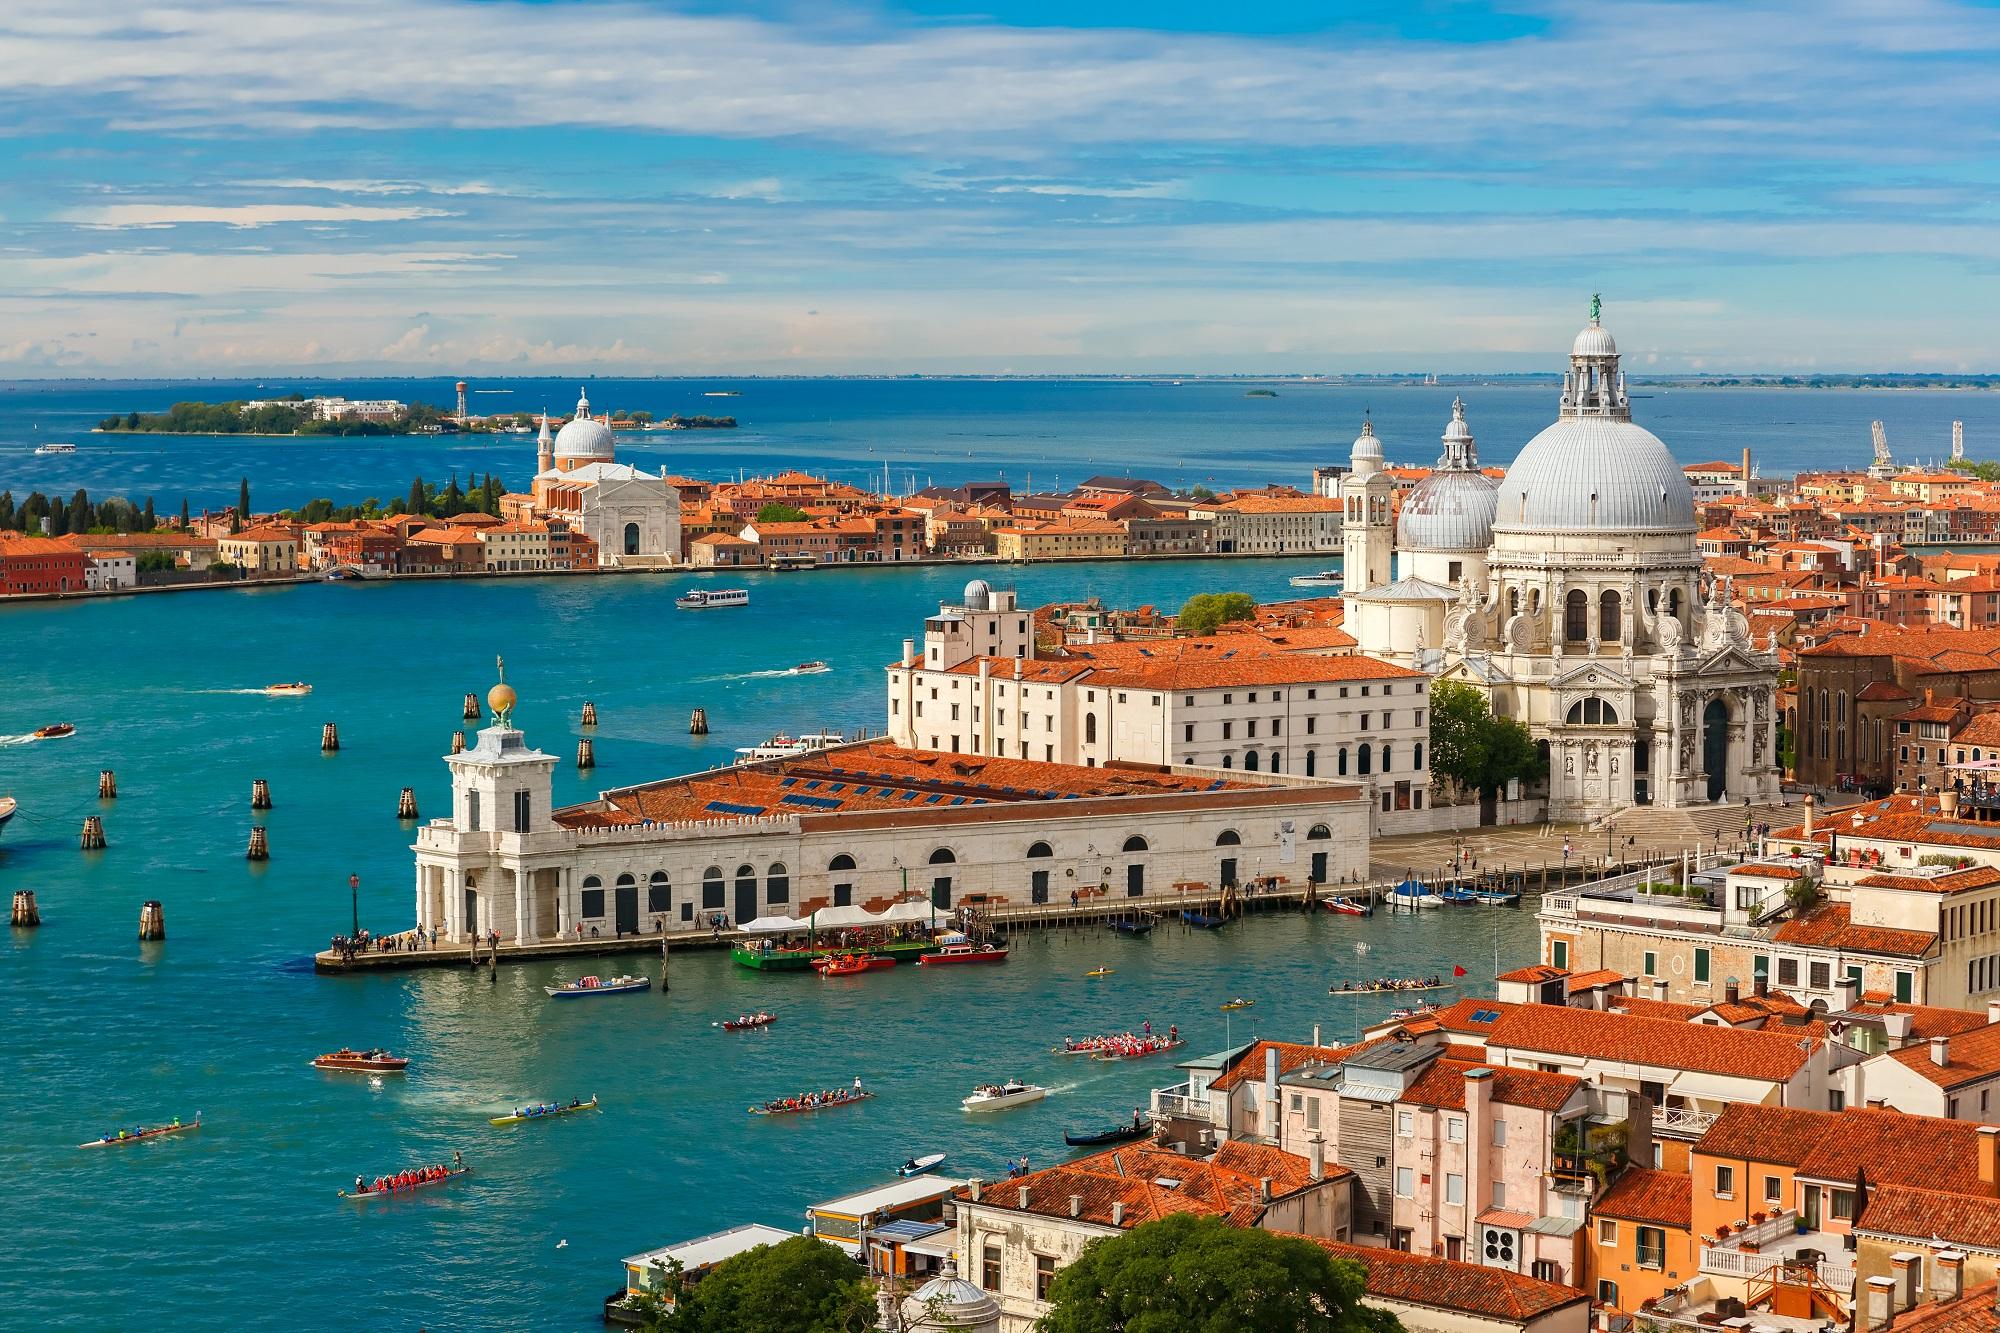 View from Campanile di San Marco to Grand Canal and Basilica di Santa Maria della Salute during Vogalonga regatta at summer morning in Venice, Italy